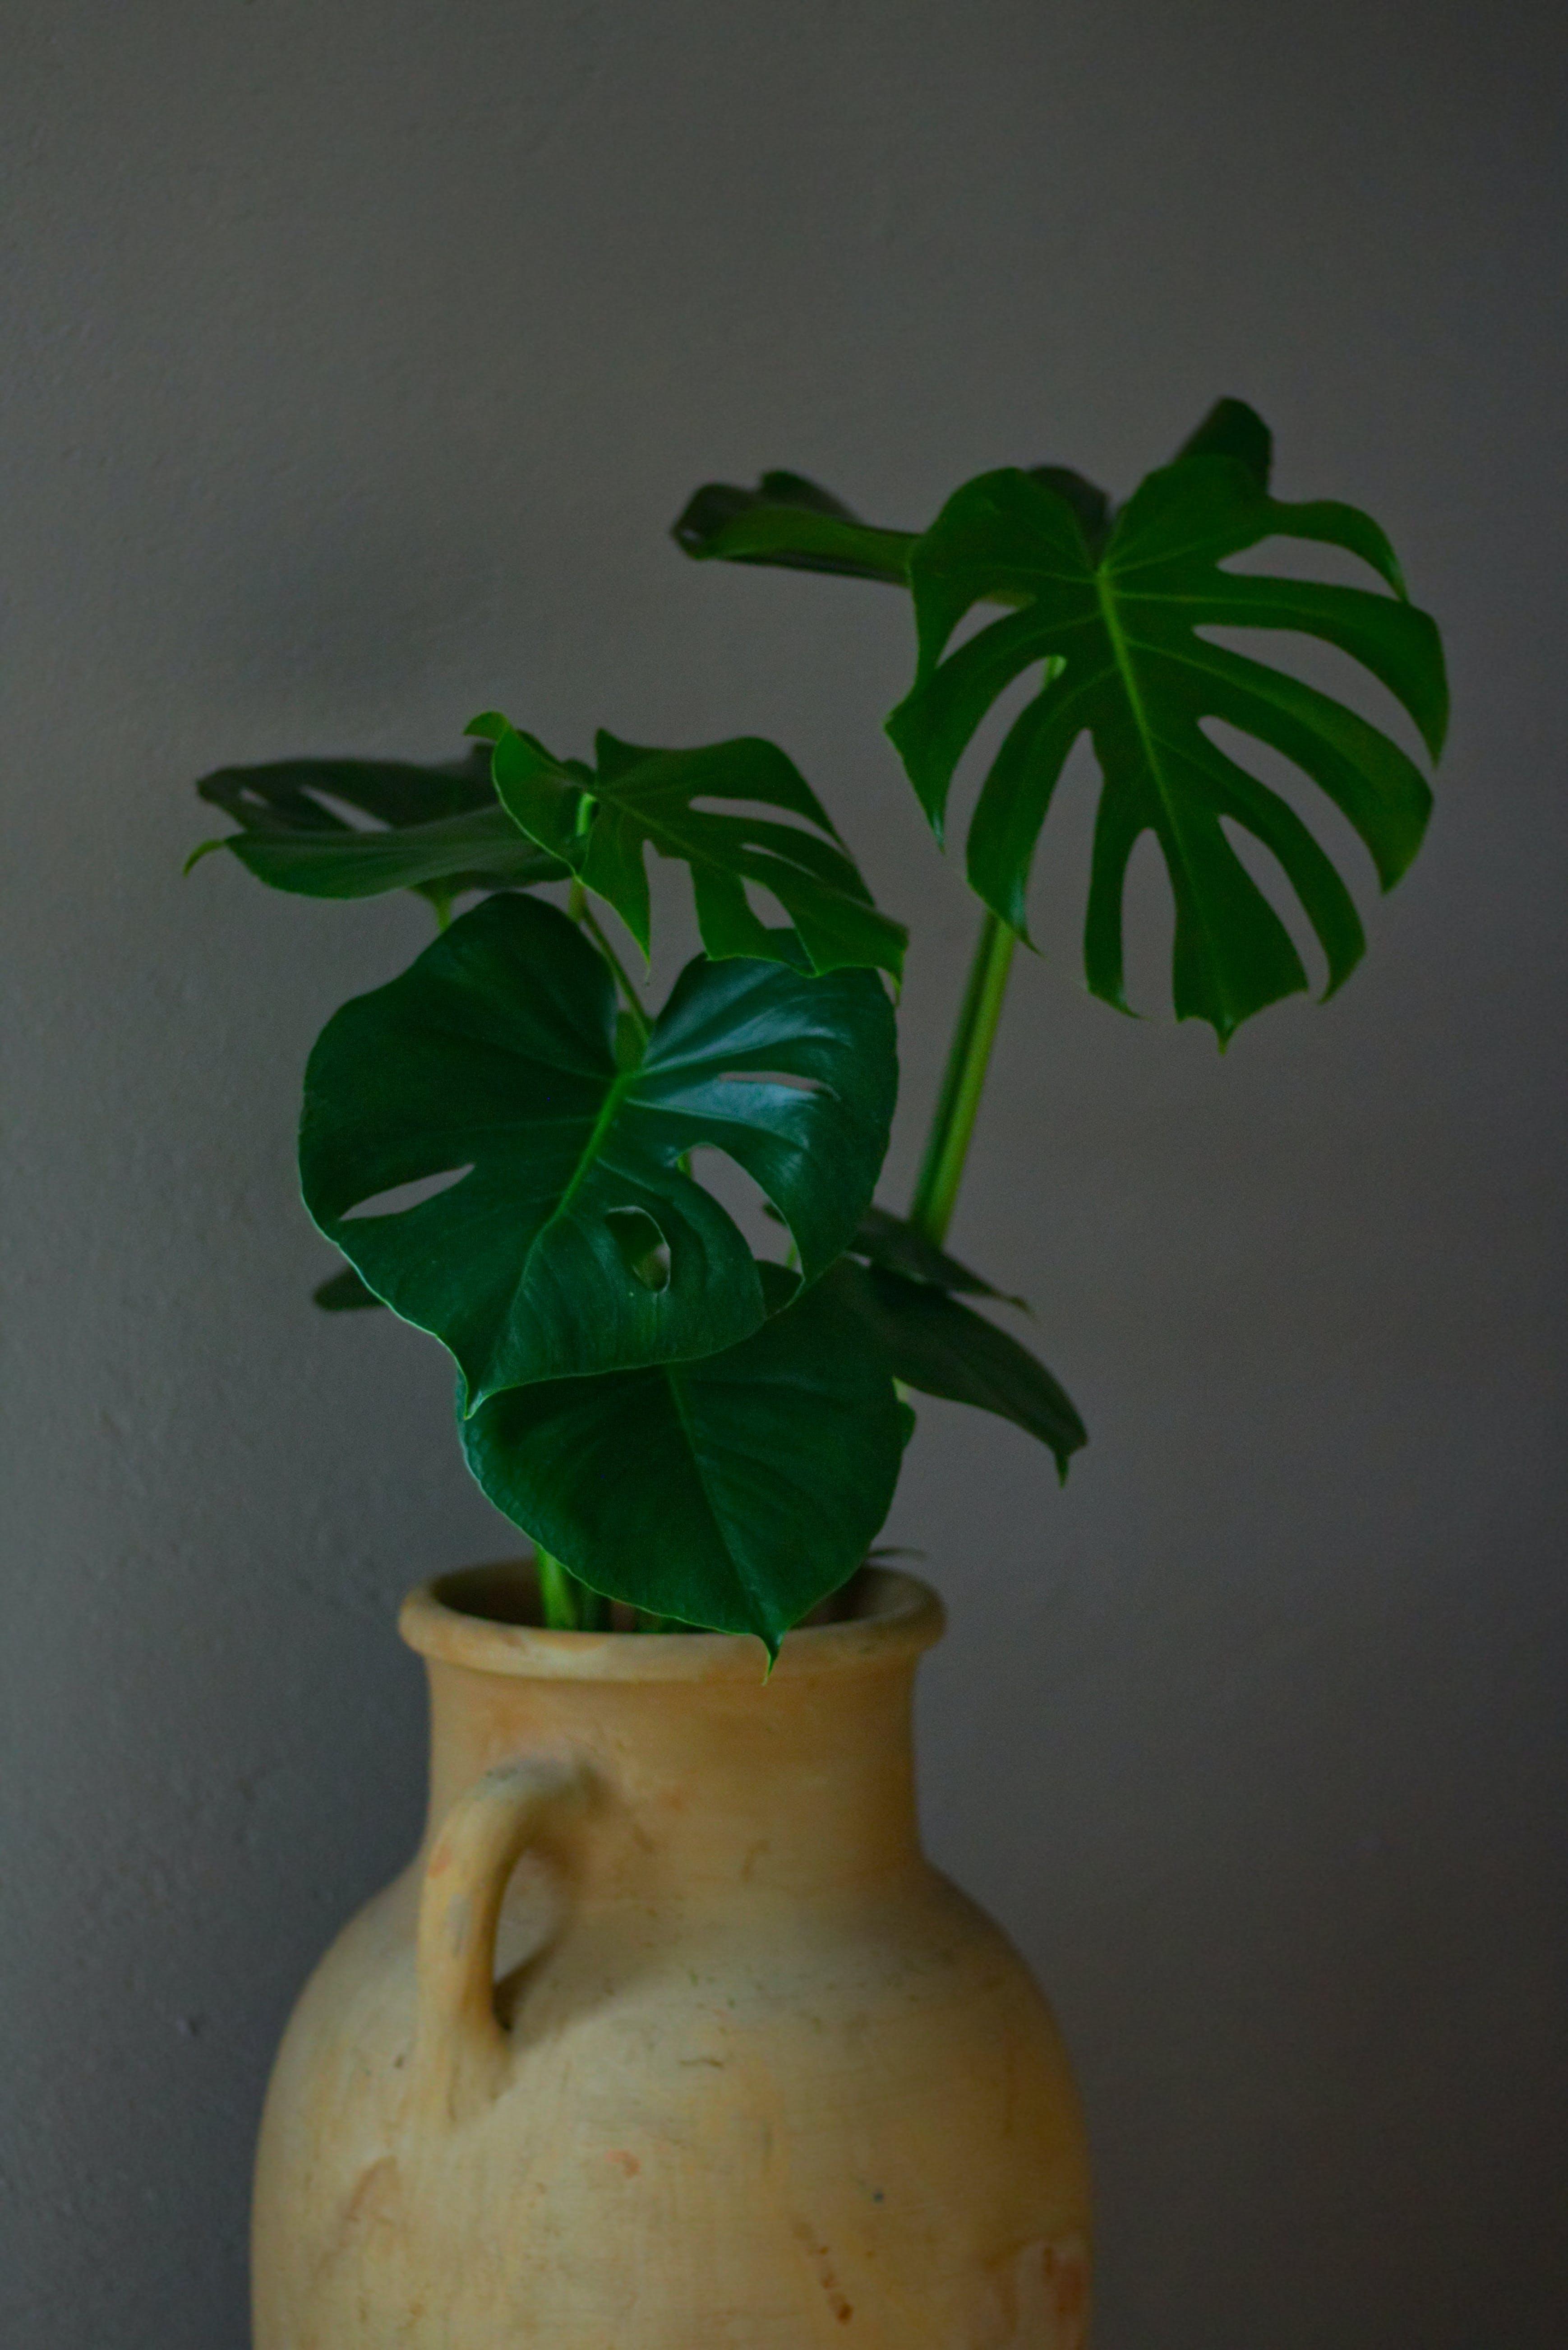 Free stock photo of 4k wallpaper, dark green plants, garden